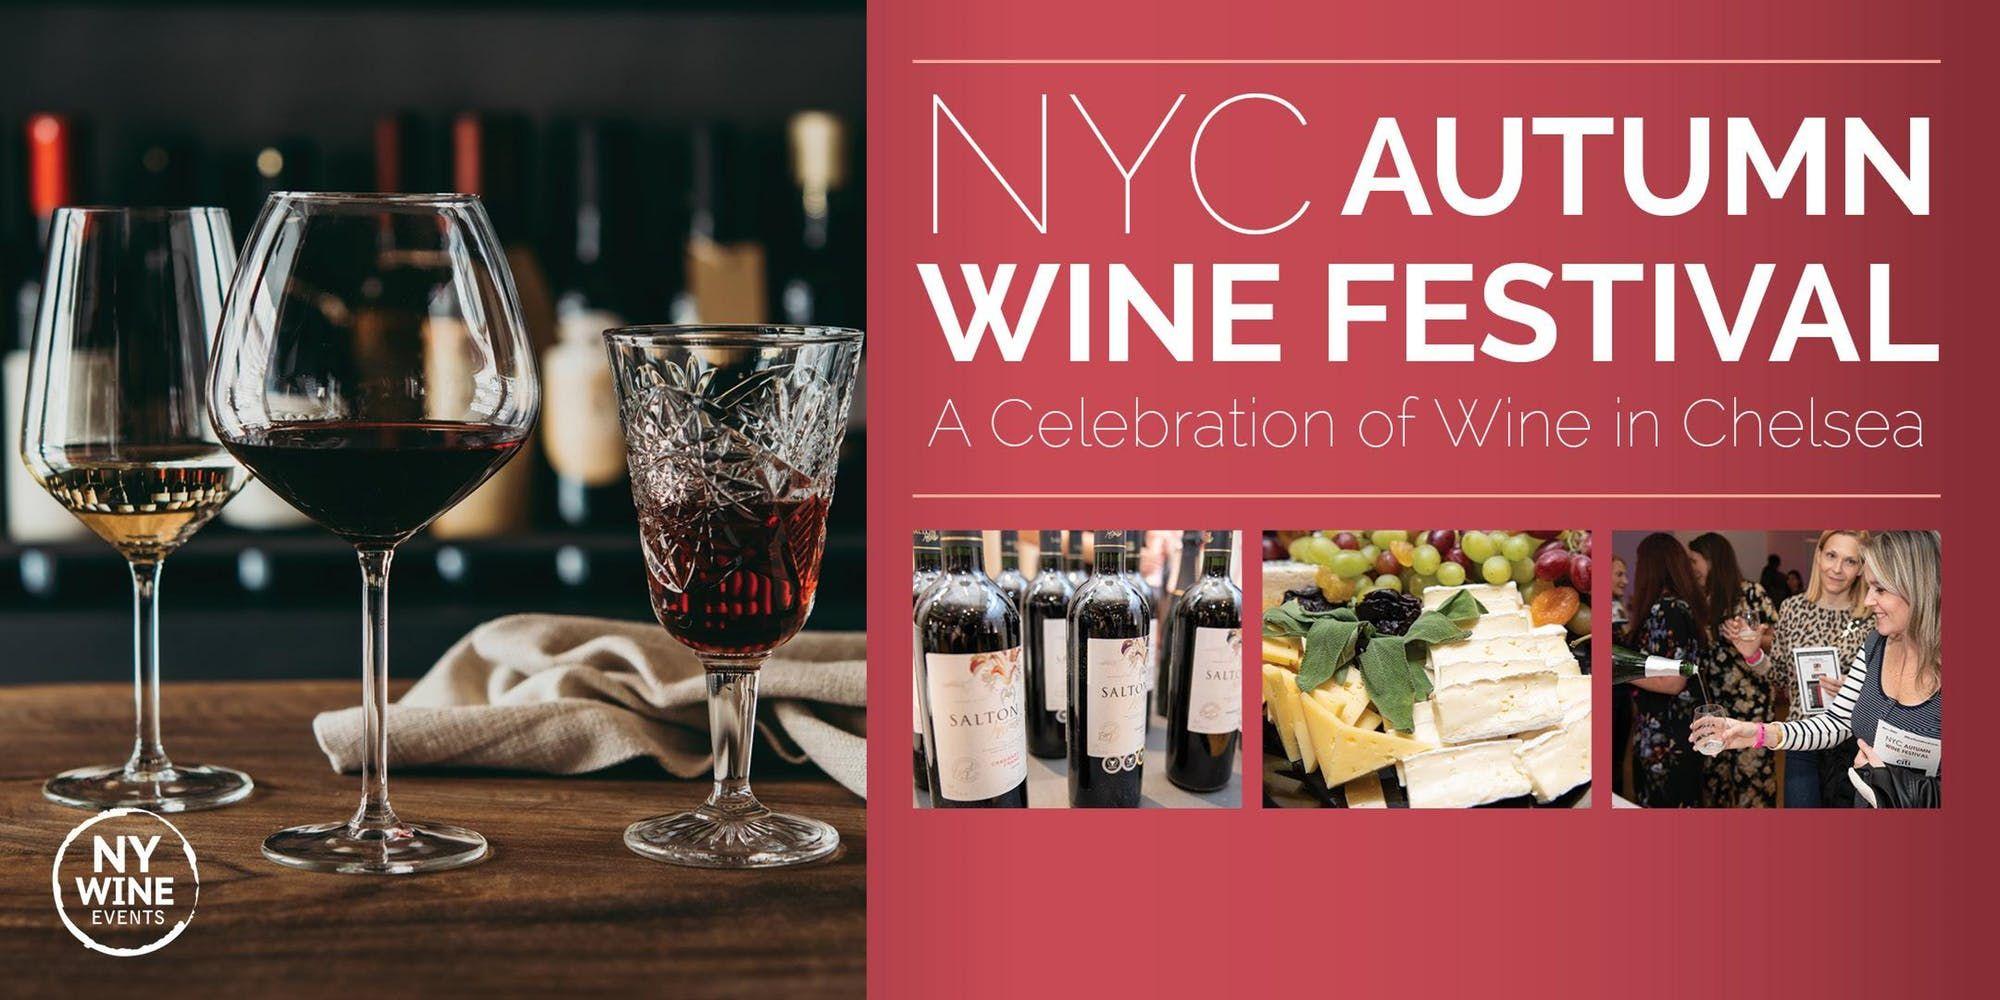 Nyc Autumn Wine Food Festival Wine Festival Autumn Wine Wine And Food Festival